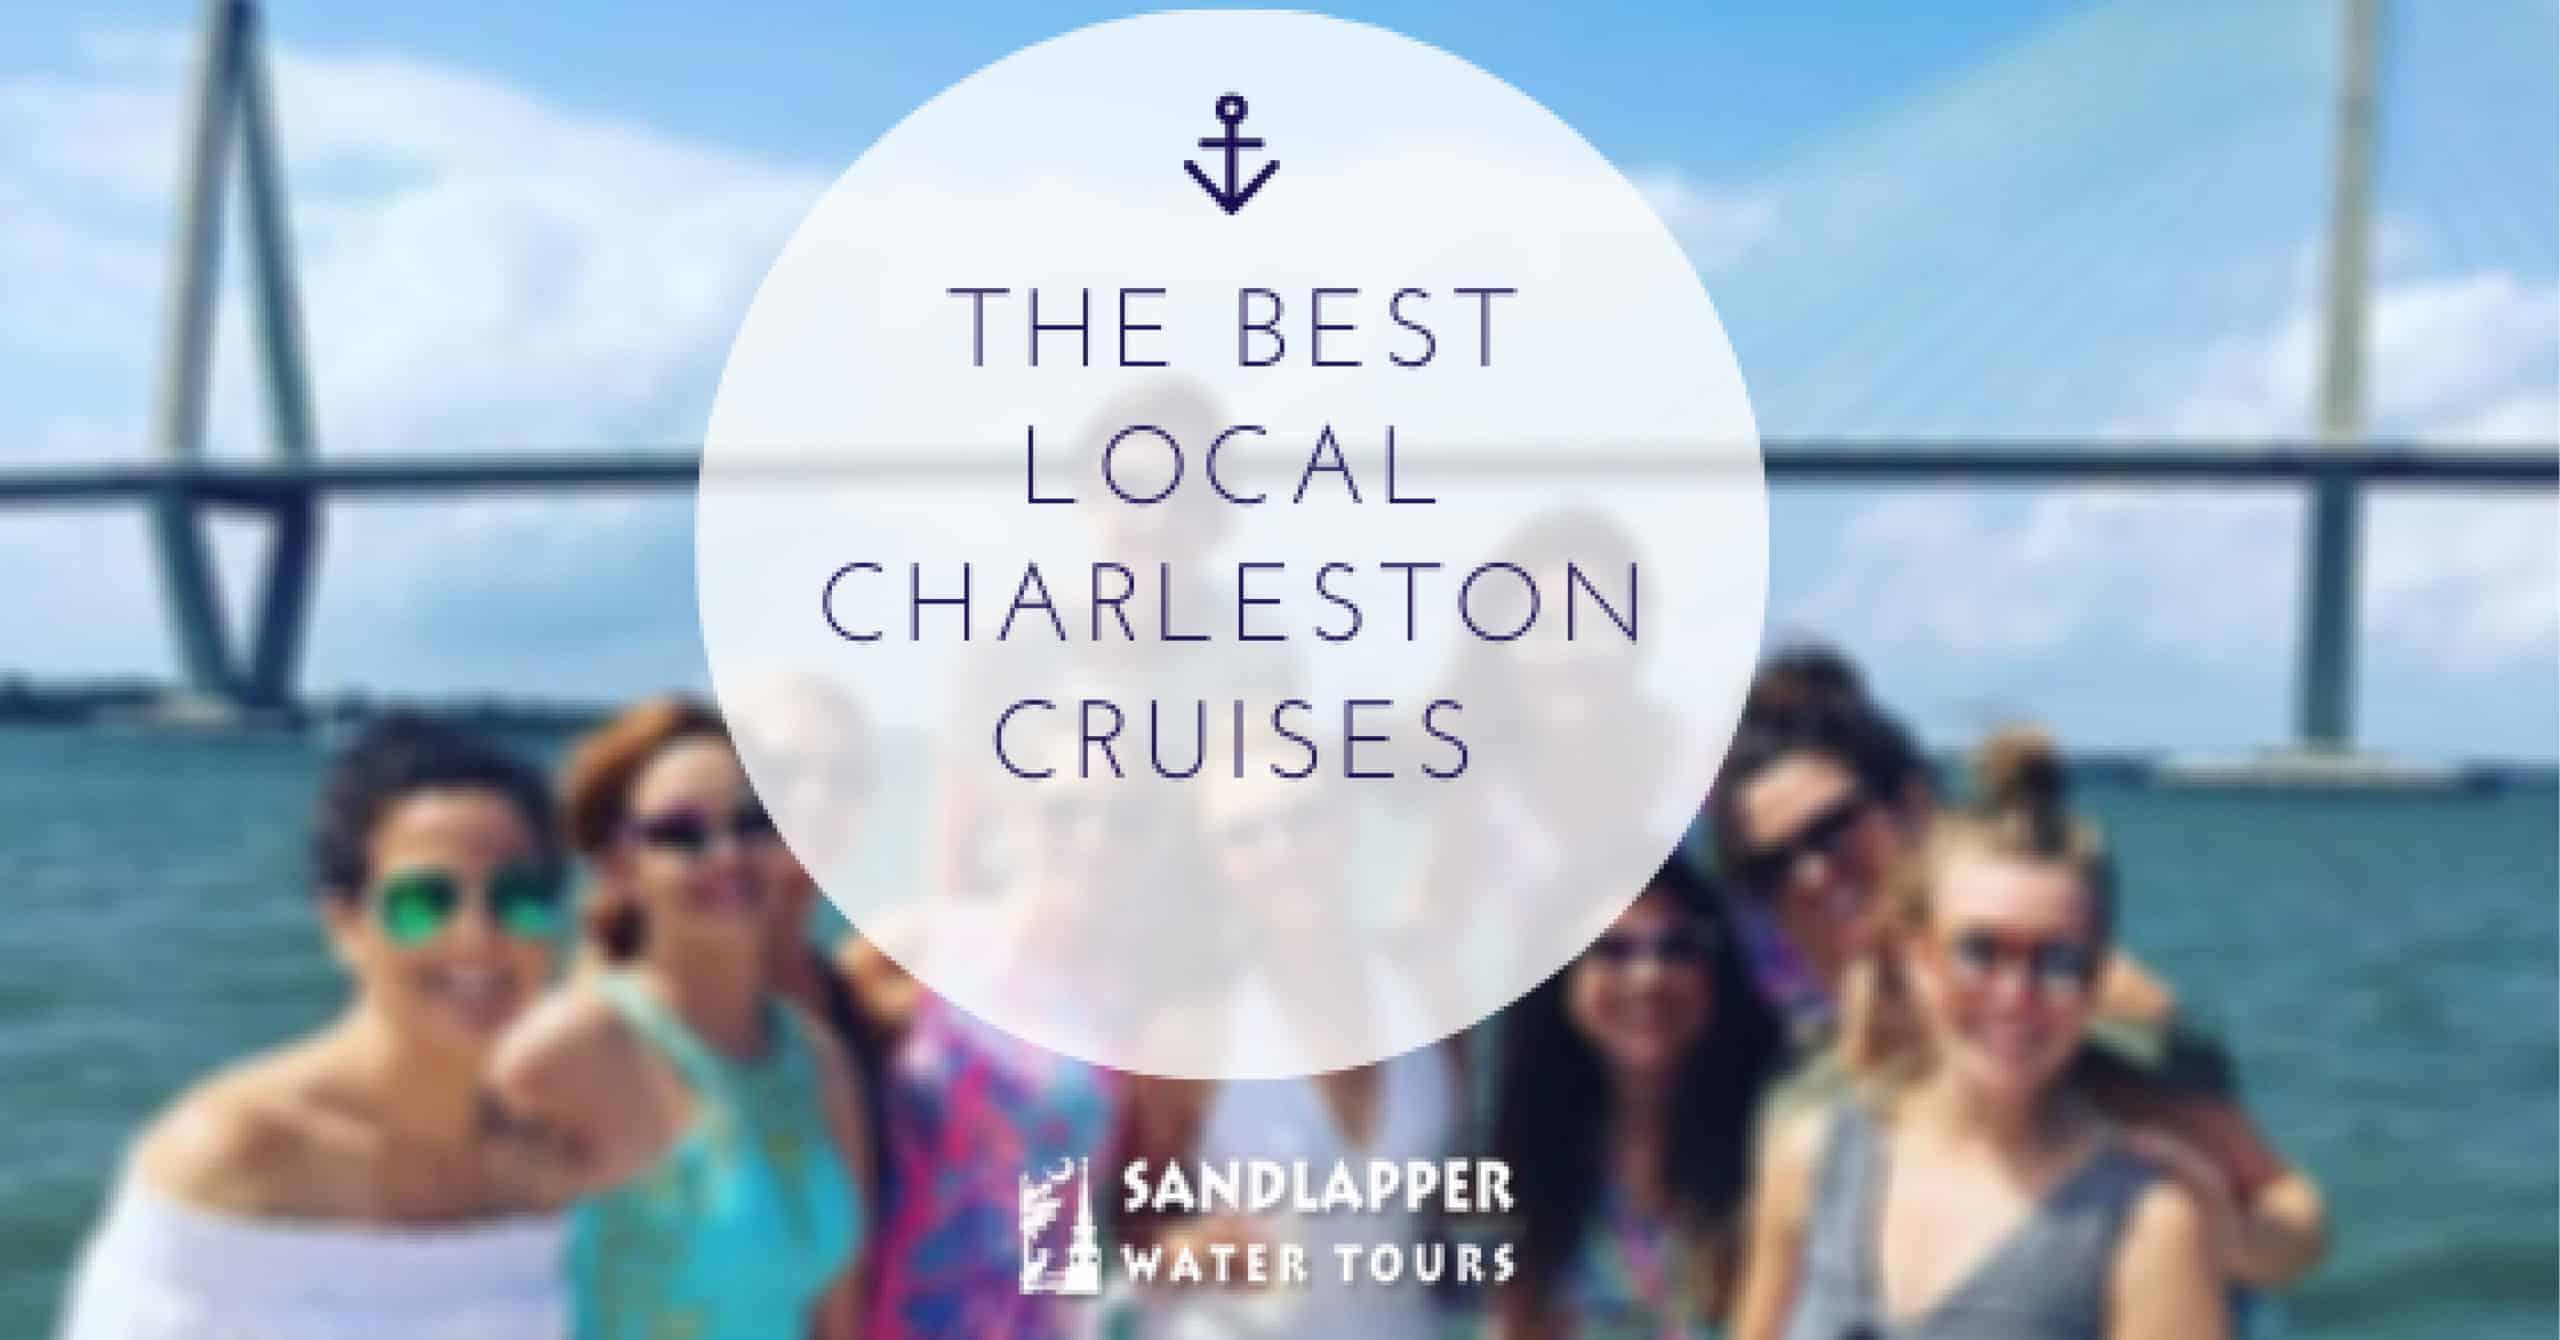 The Best Local Charleston Cruises. Sandlapper Water Tours Blog